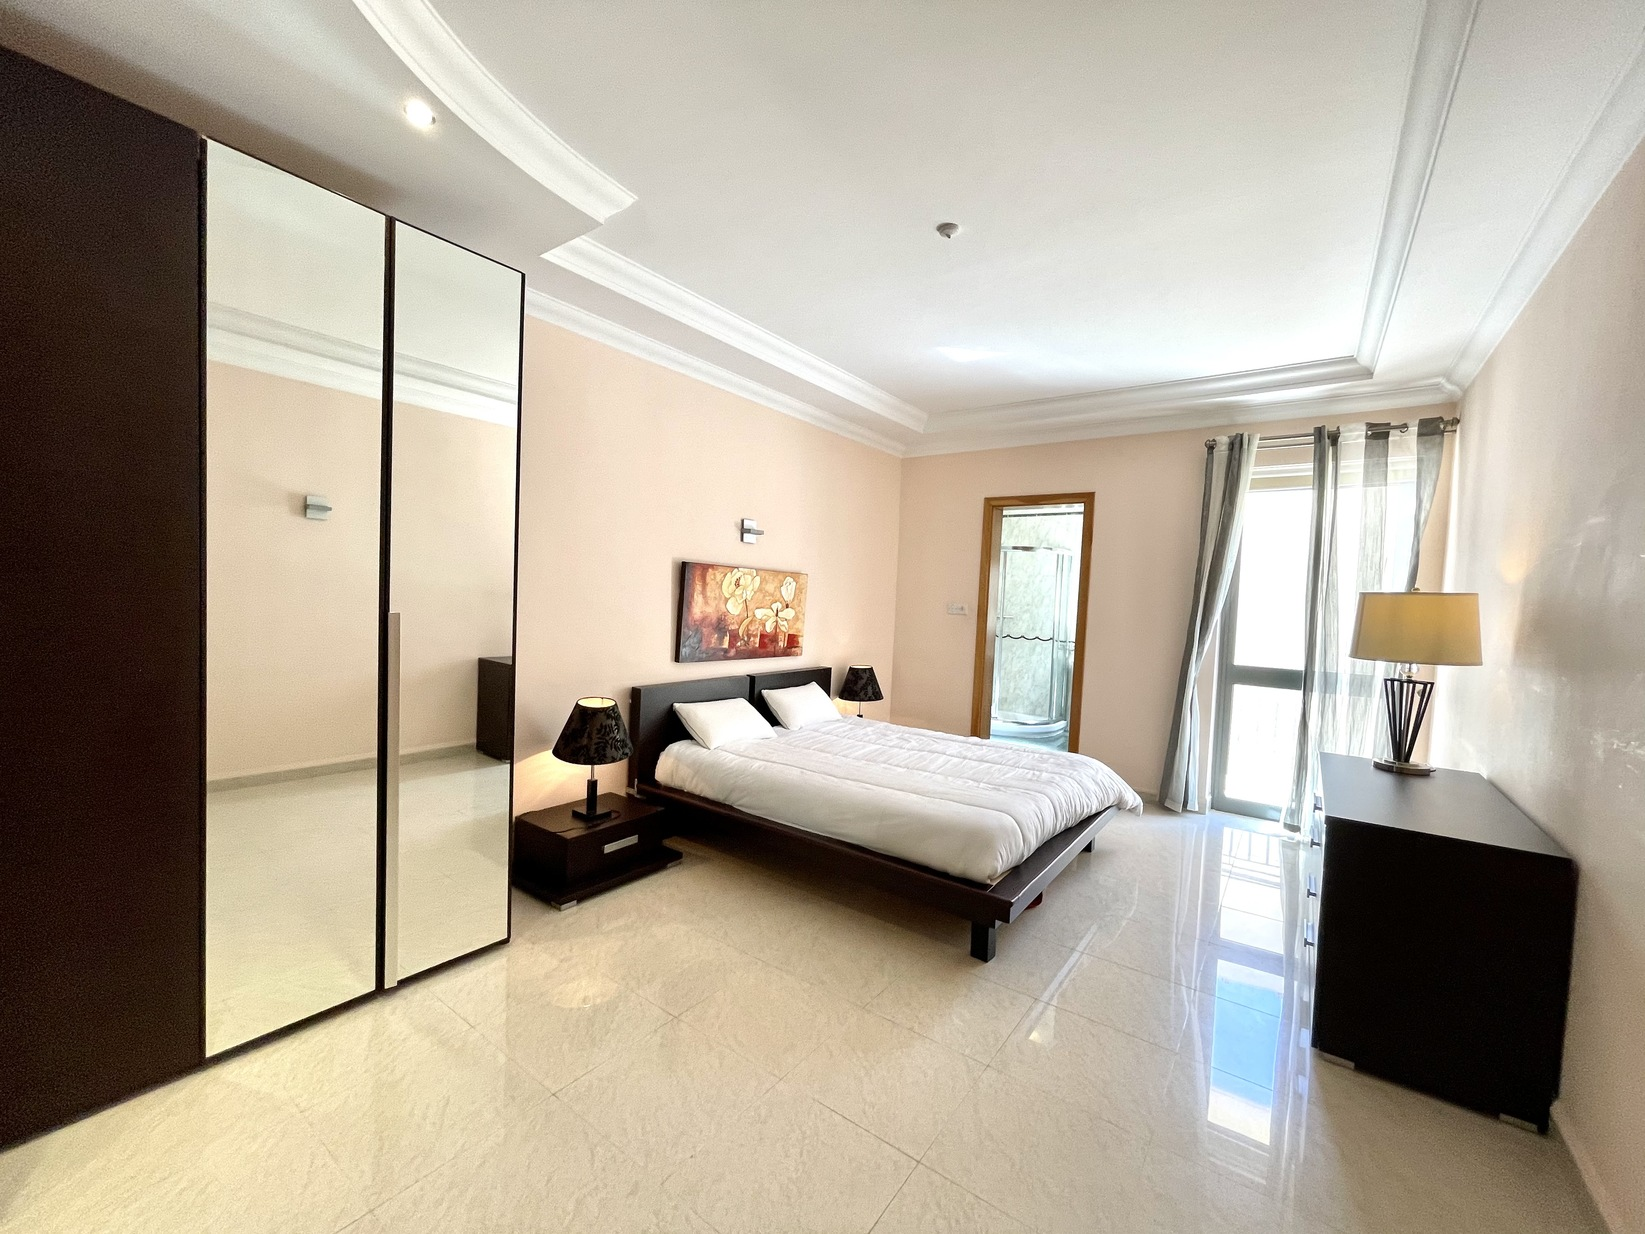 3 bed Apartment For Rent in Sliema, Sliema - thumb 20